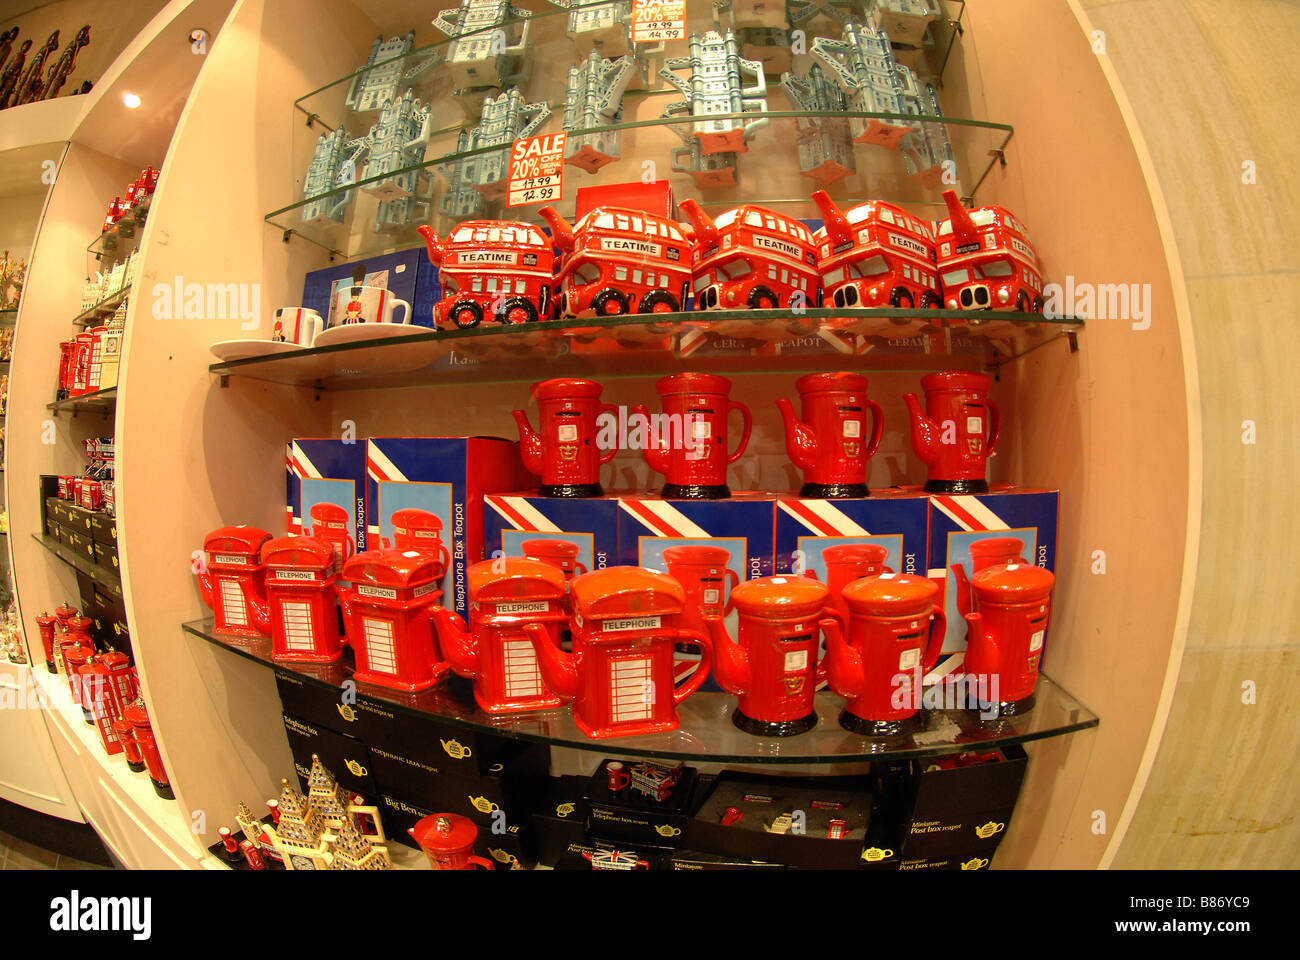 London Shop Stock Photos & London Shop Stock Images - Alamy